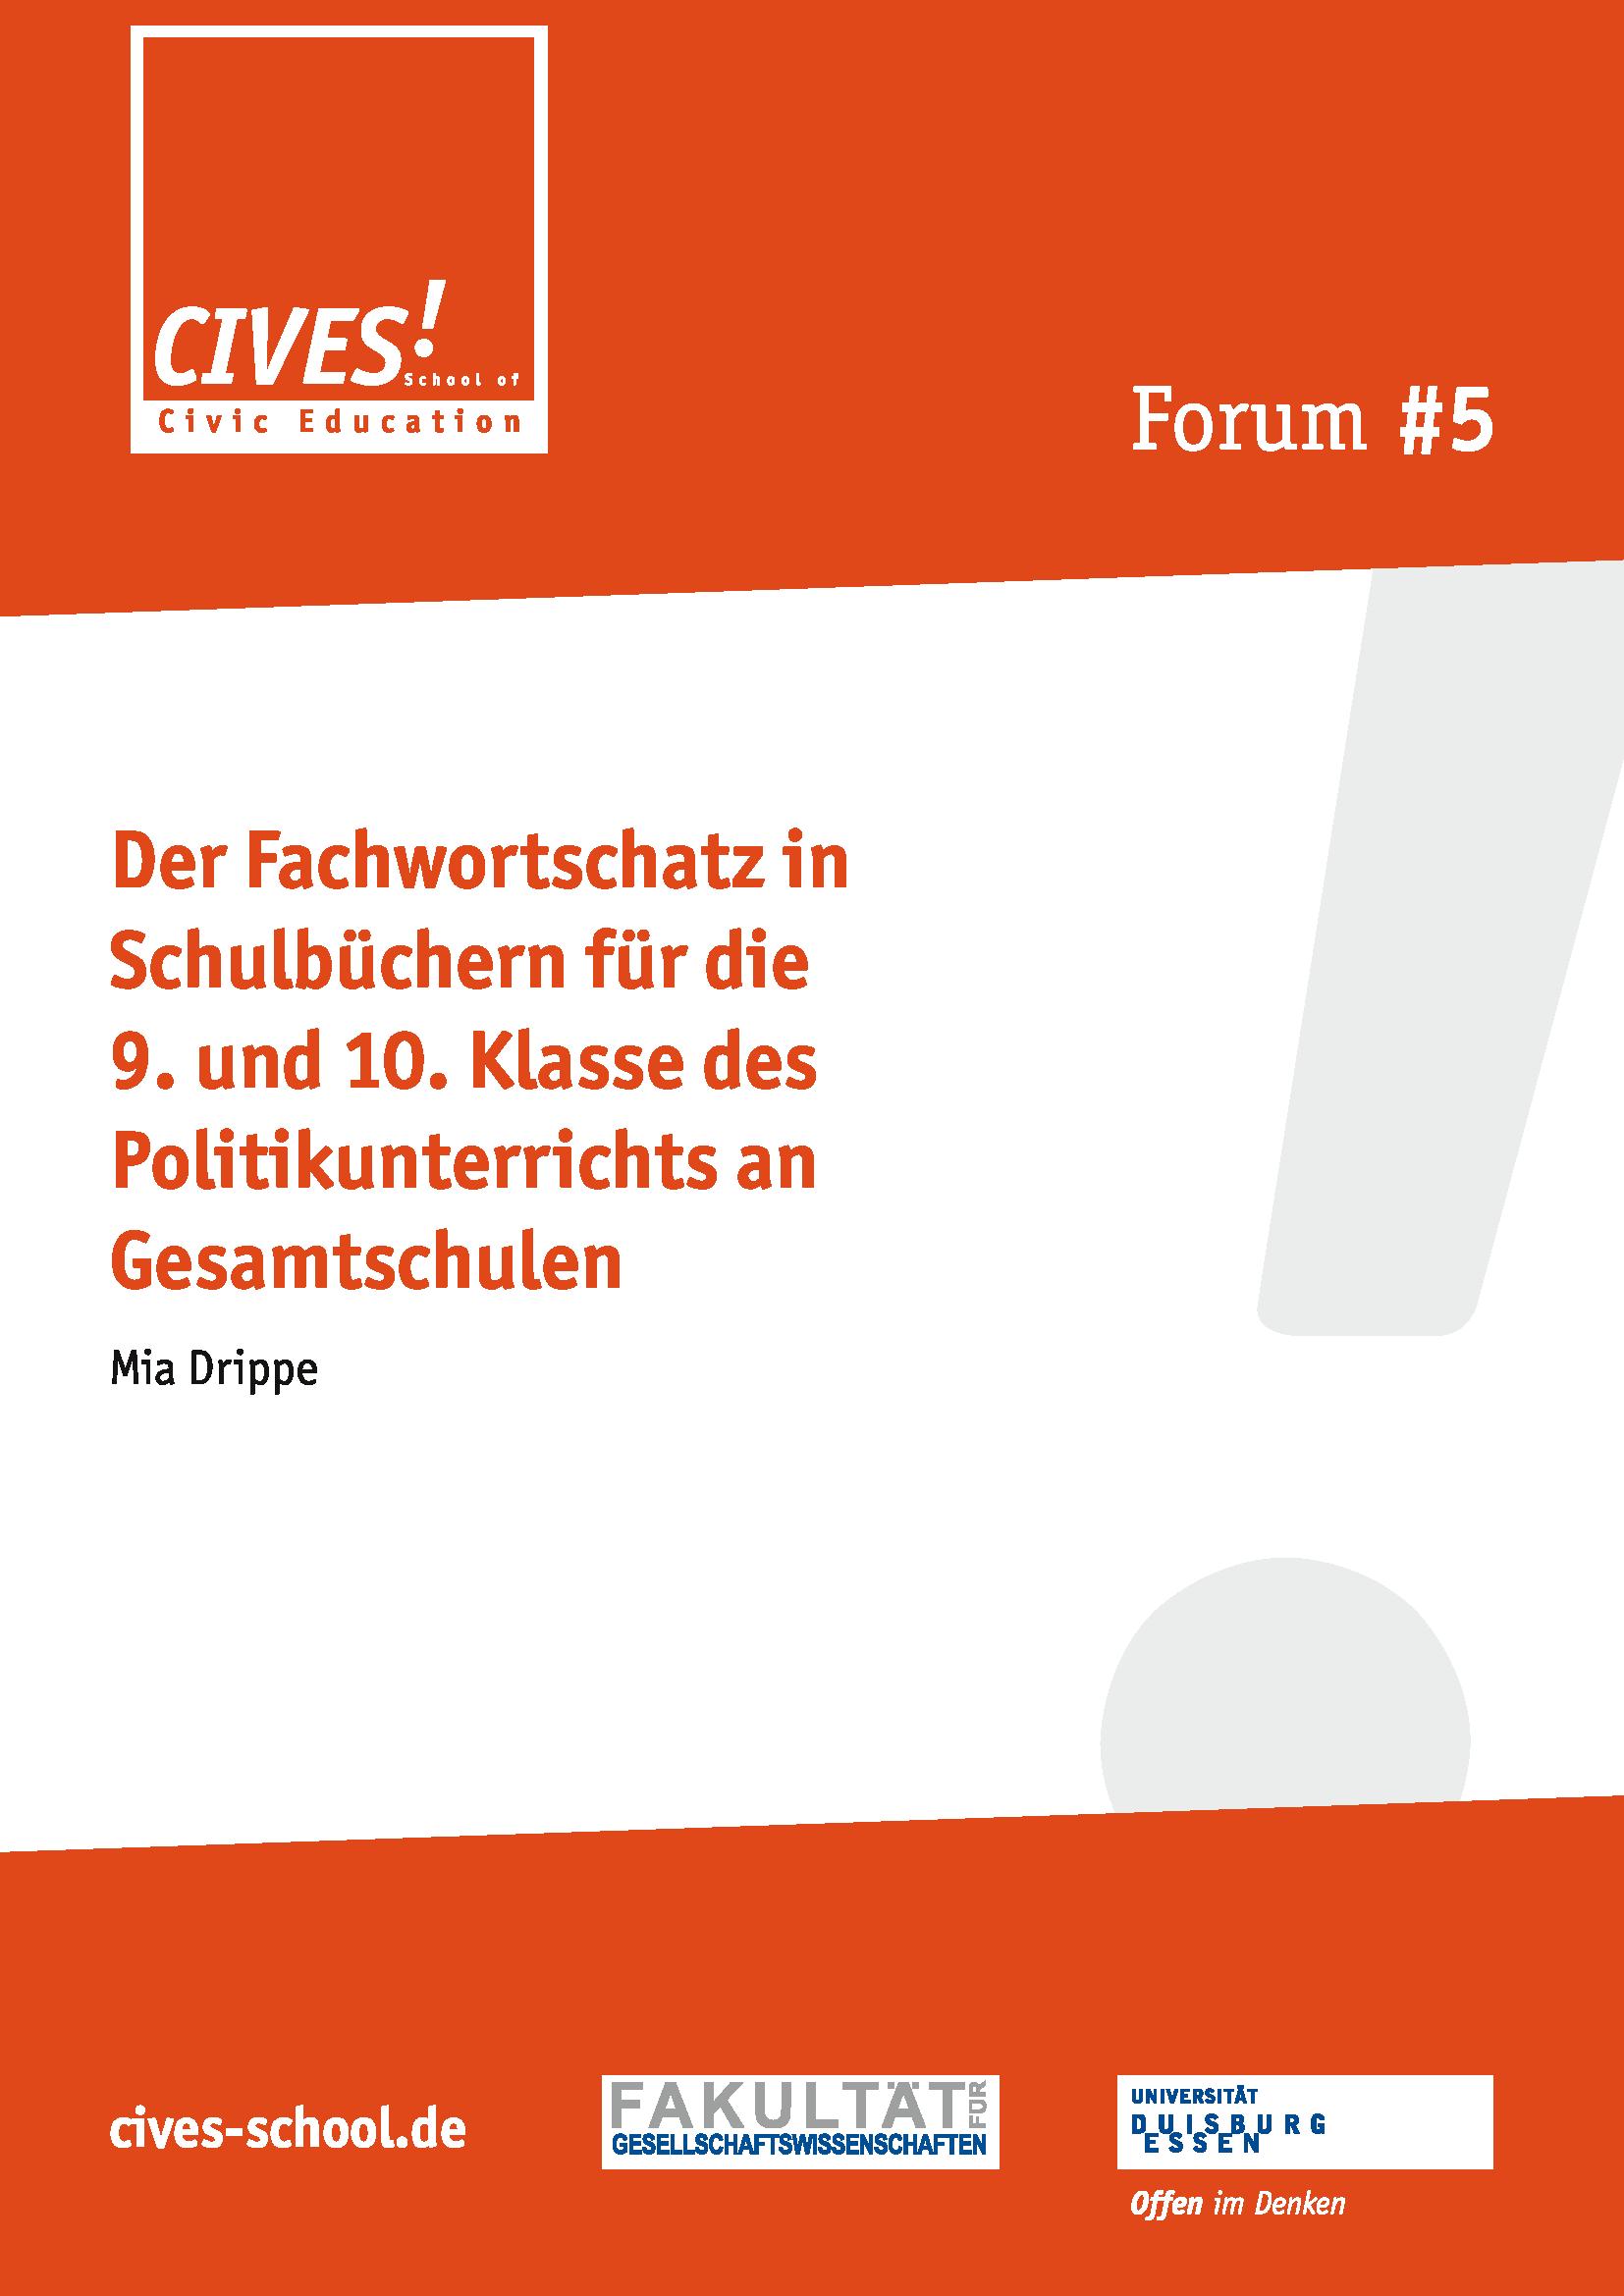 CIVES-Forum 5